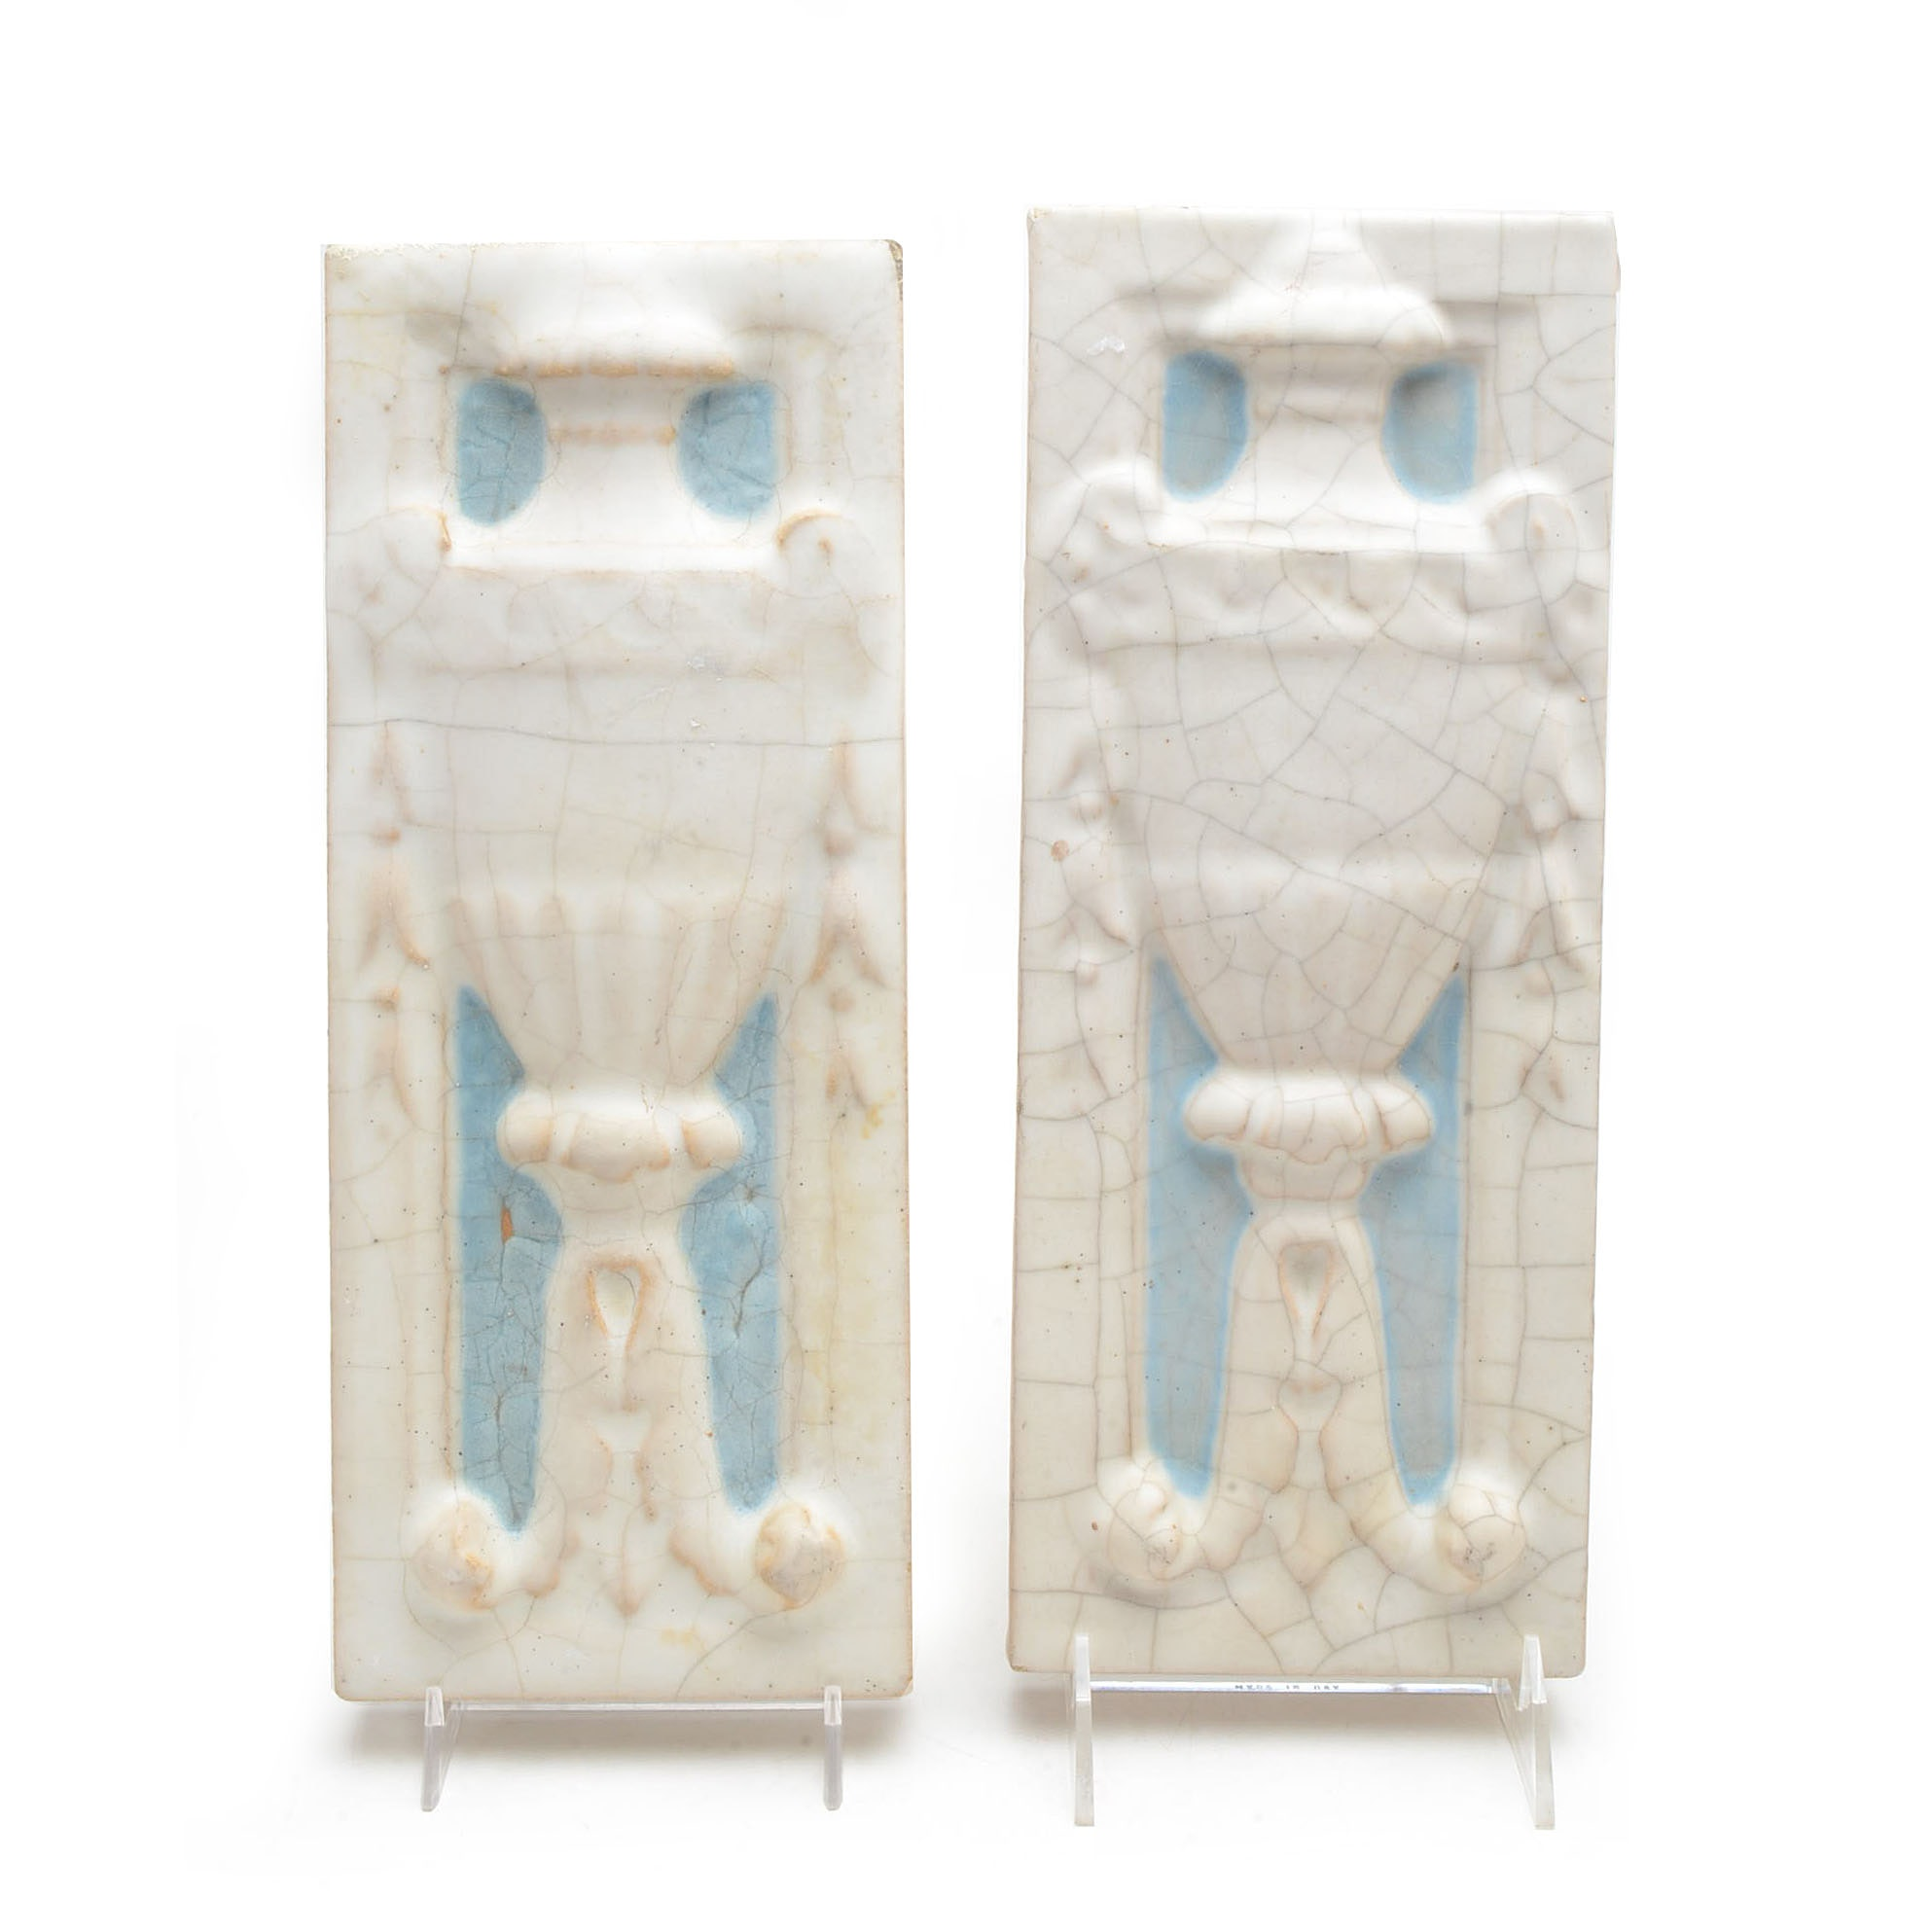 Vintage Rookwood Pottery Faience Tiles